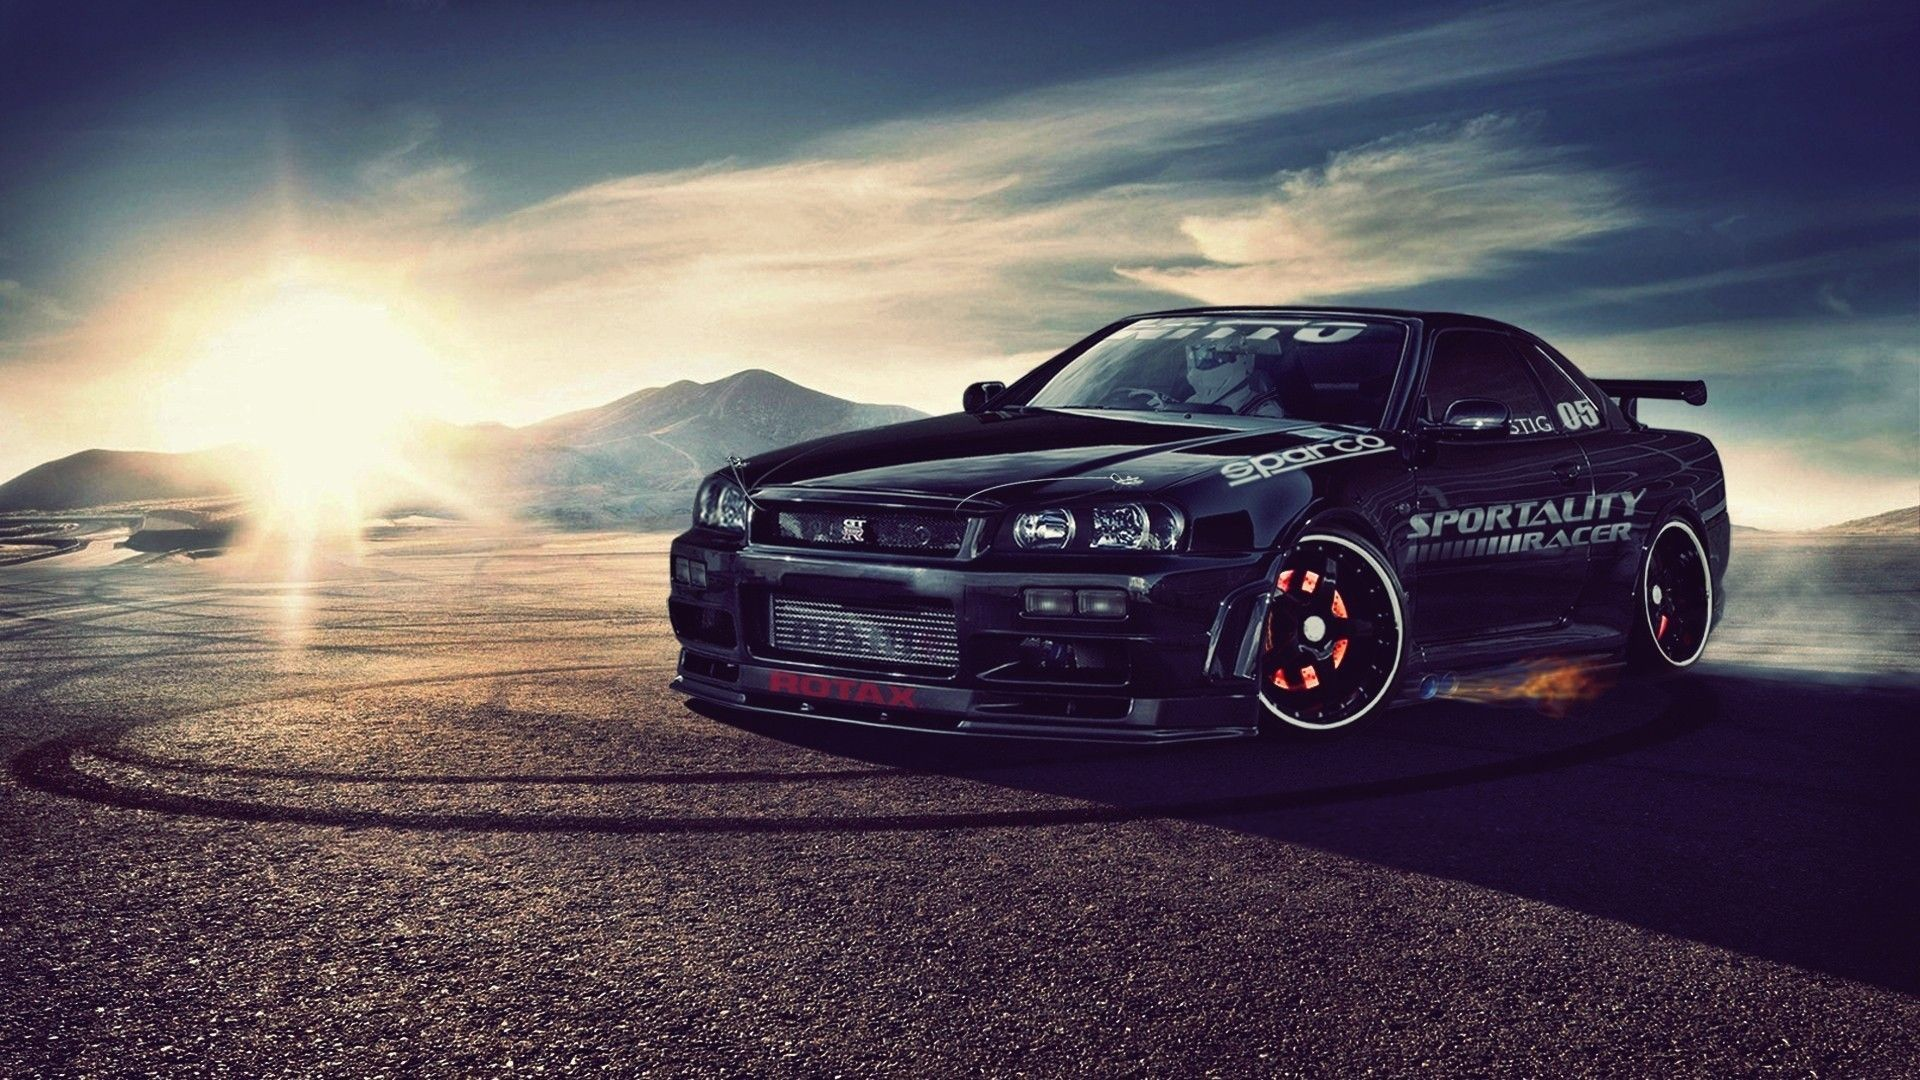 Nissan Skyline Gtr Wallpapers Top Free Nissan Skyline Gtr Backgrounds Wallpaperaccess